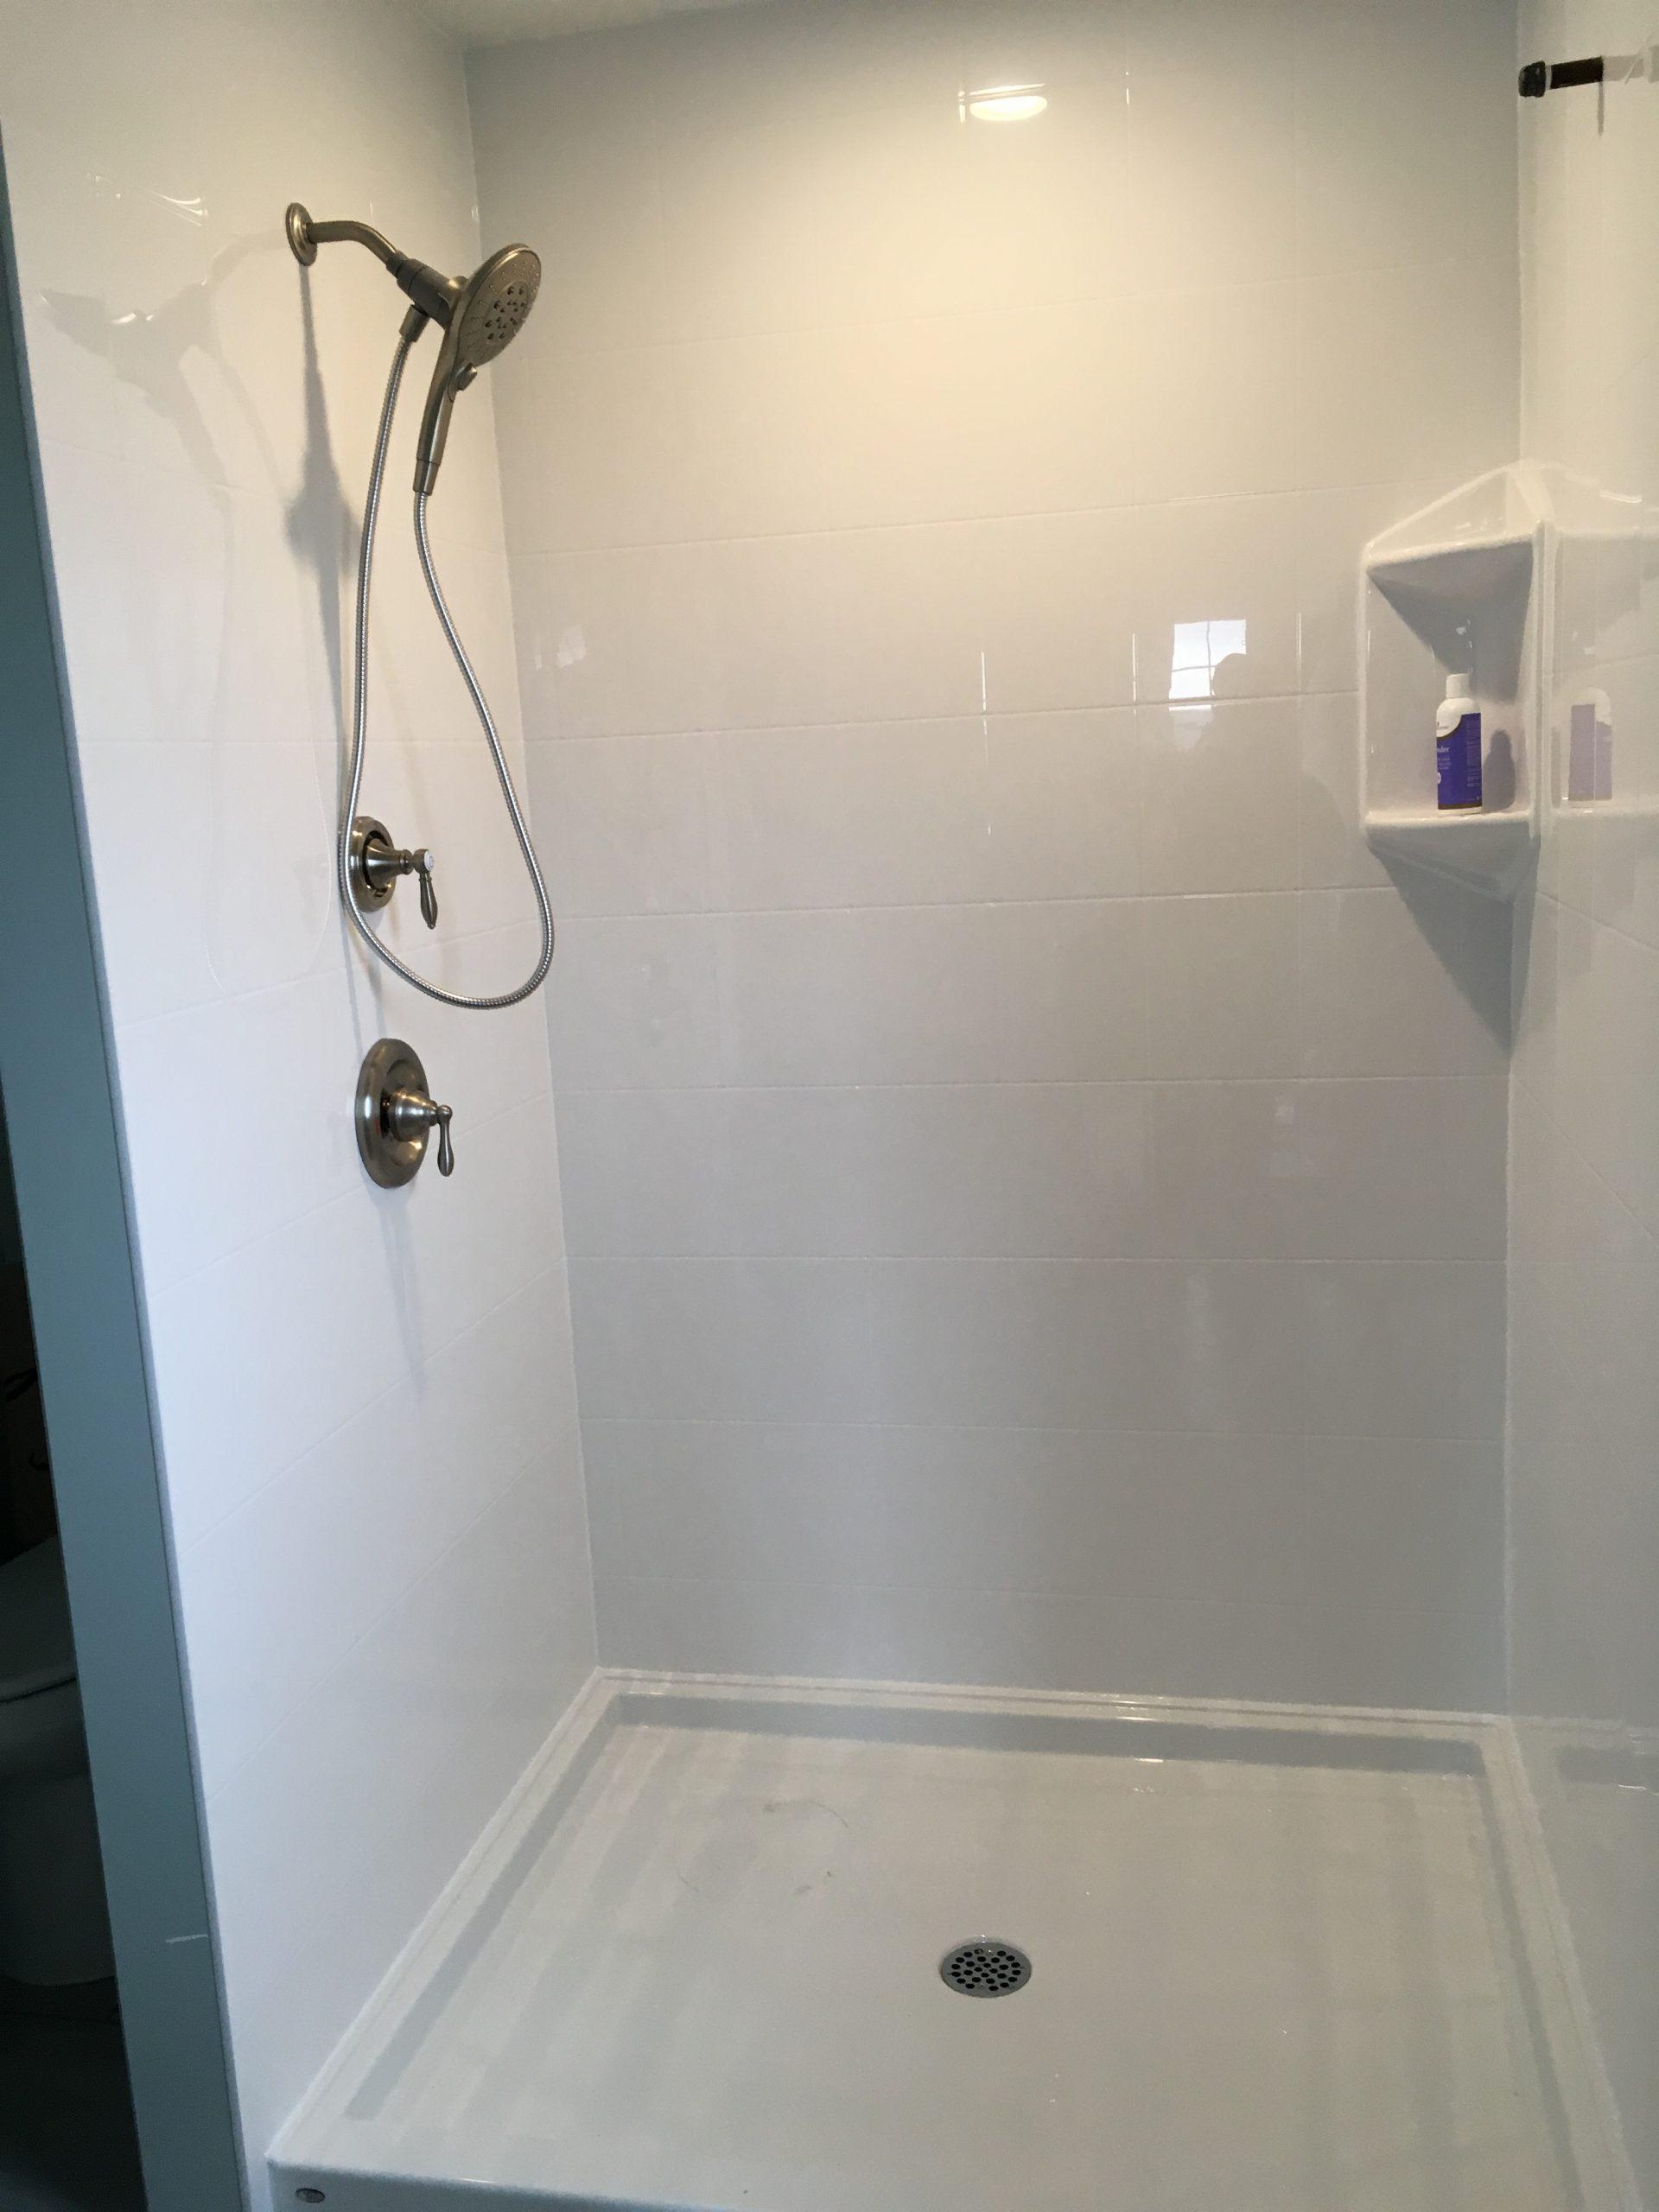 New Shower Floor and Tile by Jim Brown Interior Reglazing, Okanagan